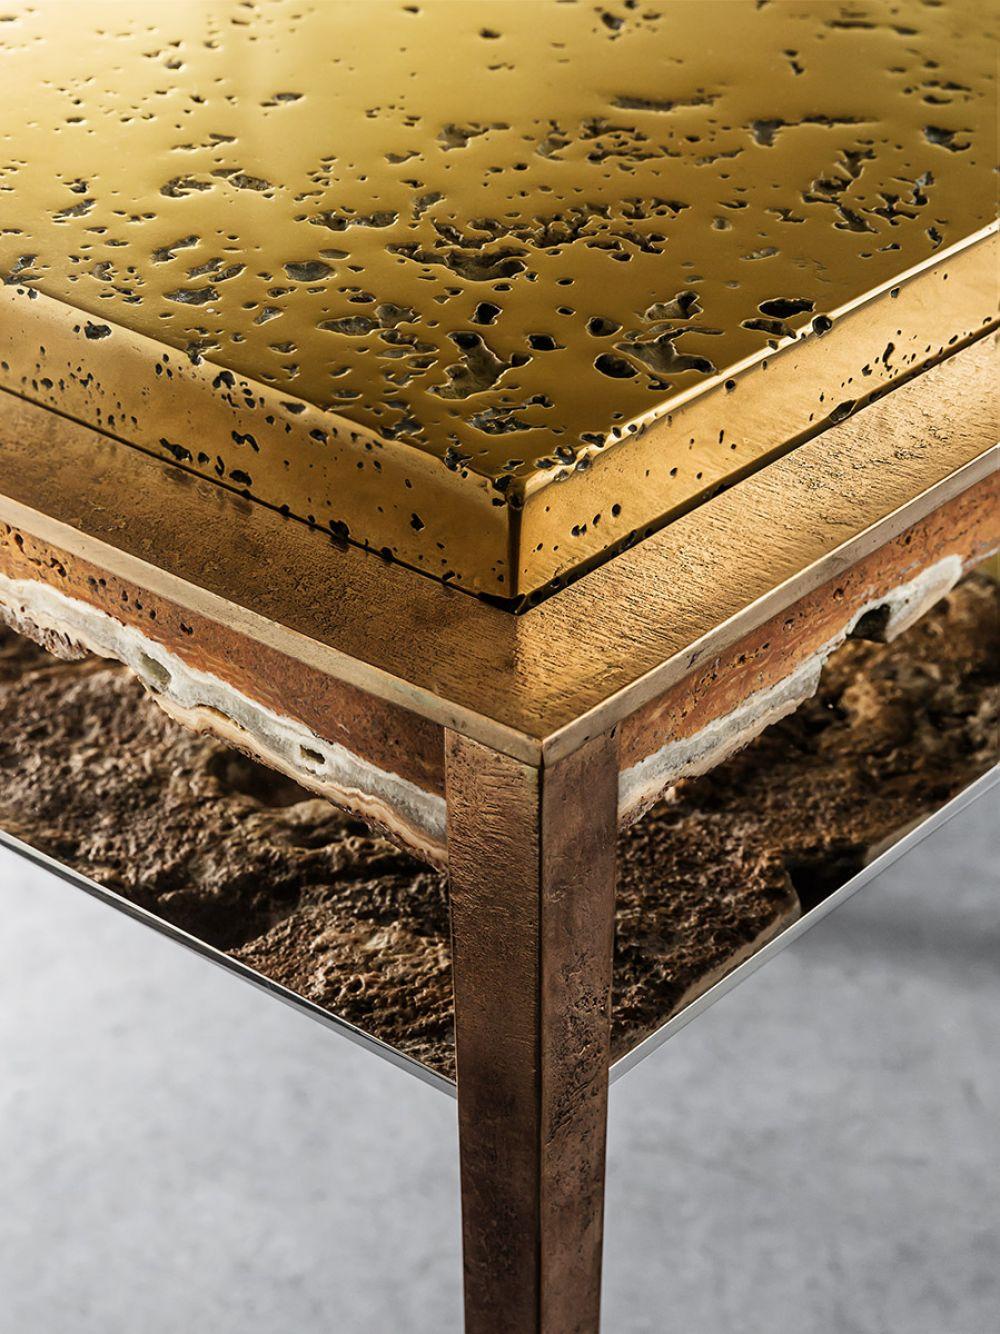 CREMINO SIDE TABLE Detail